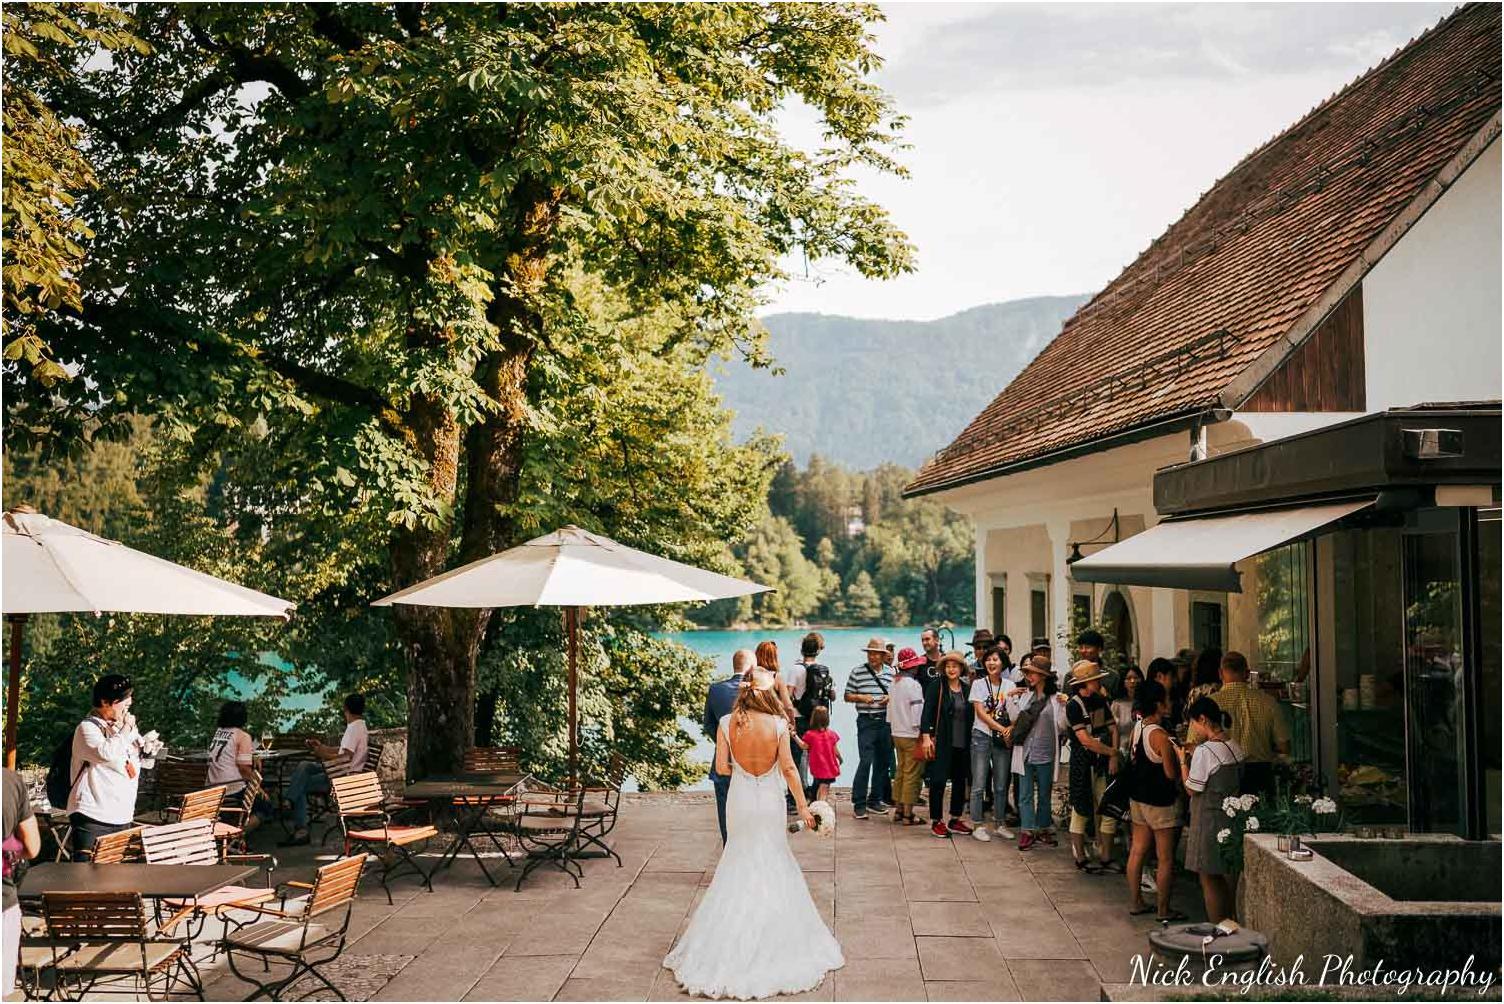 Destination_Wedding_Photographer_Slovenia_Nick_English_Photography-70-12.jpg